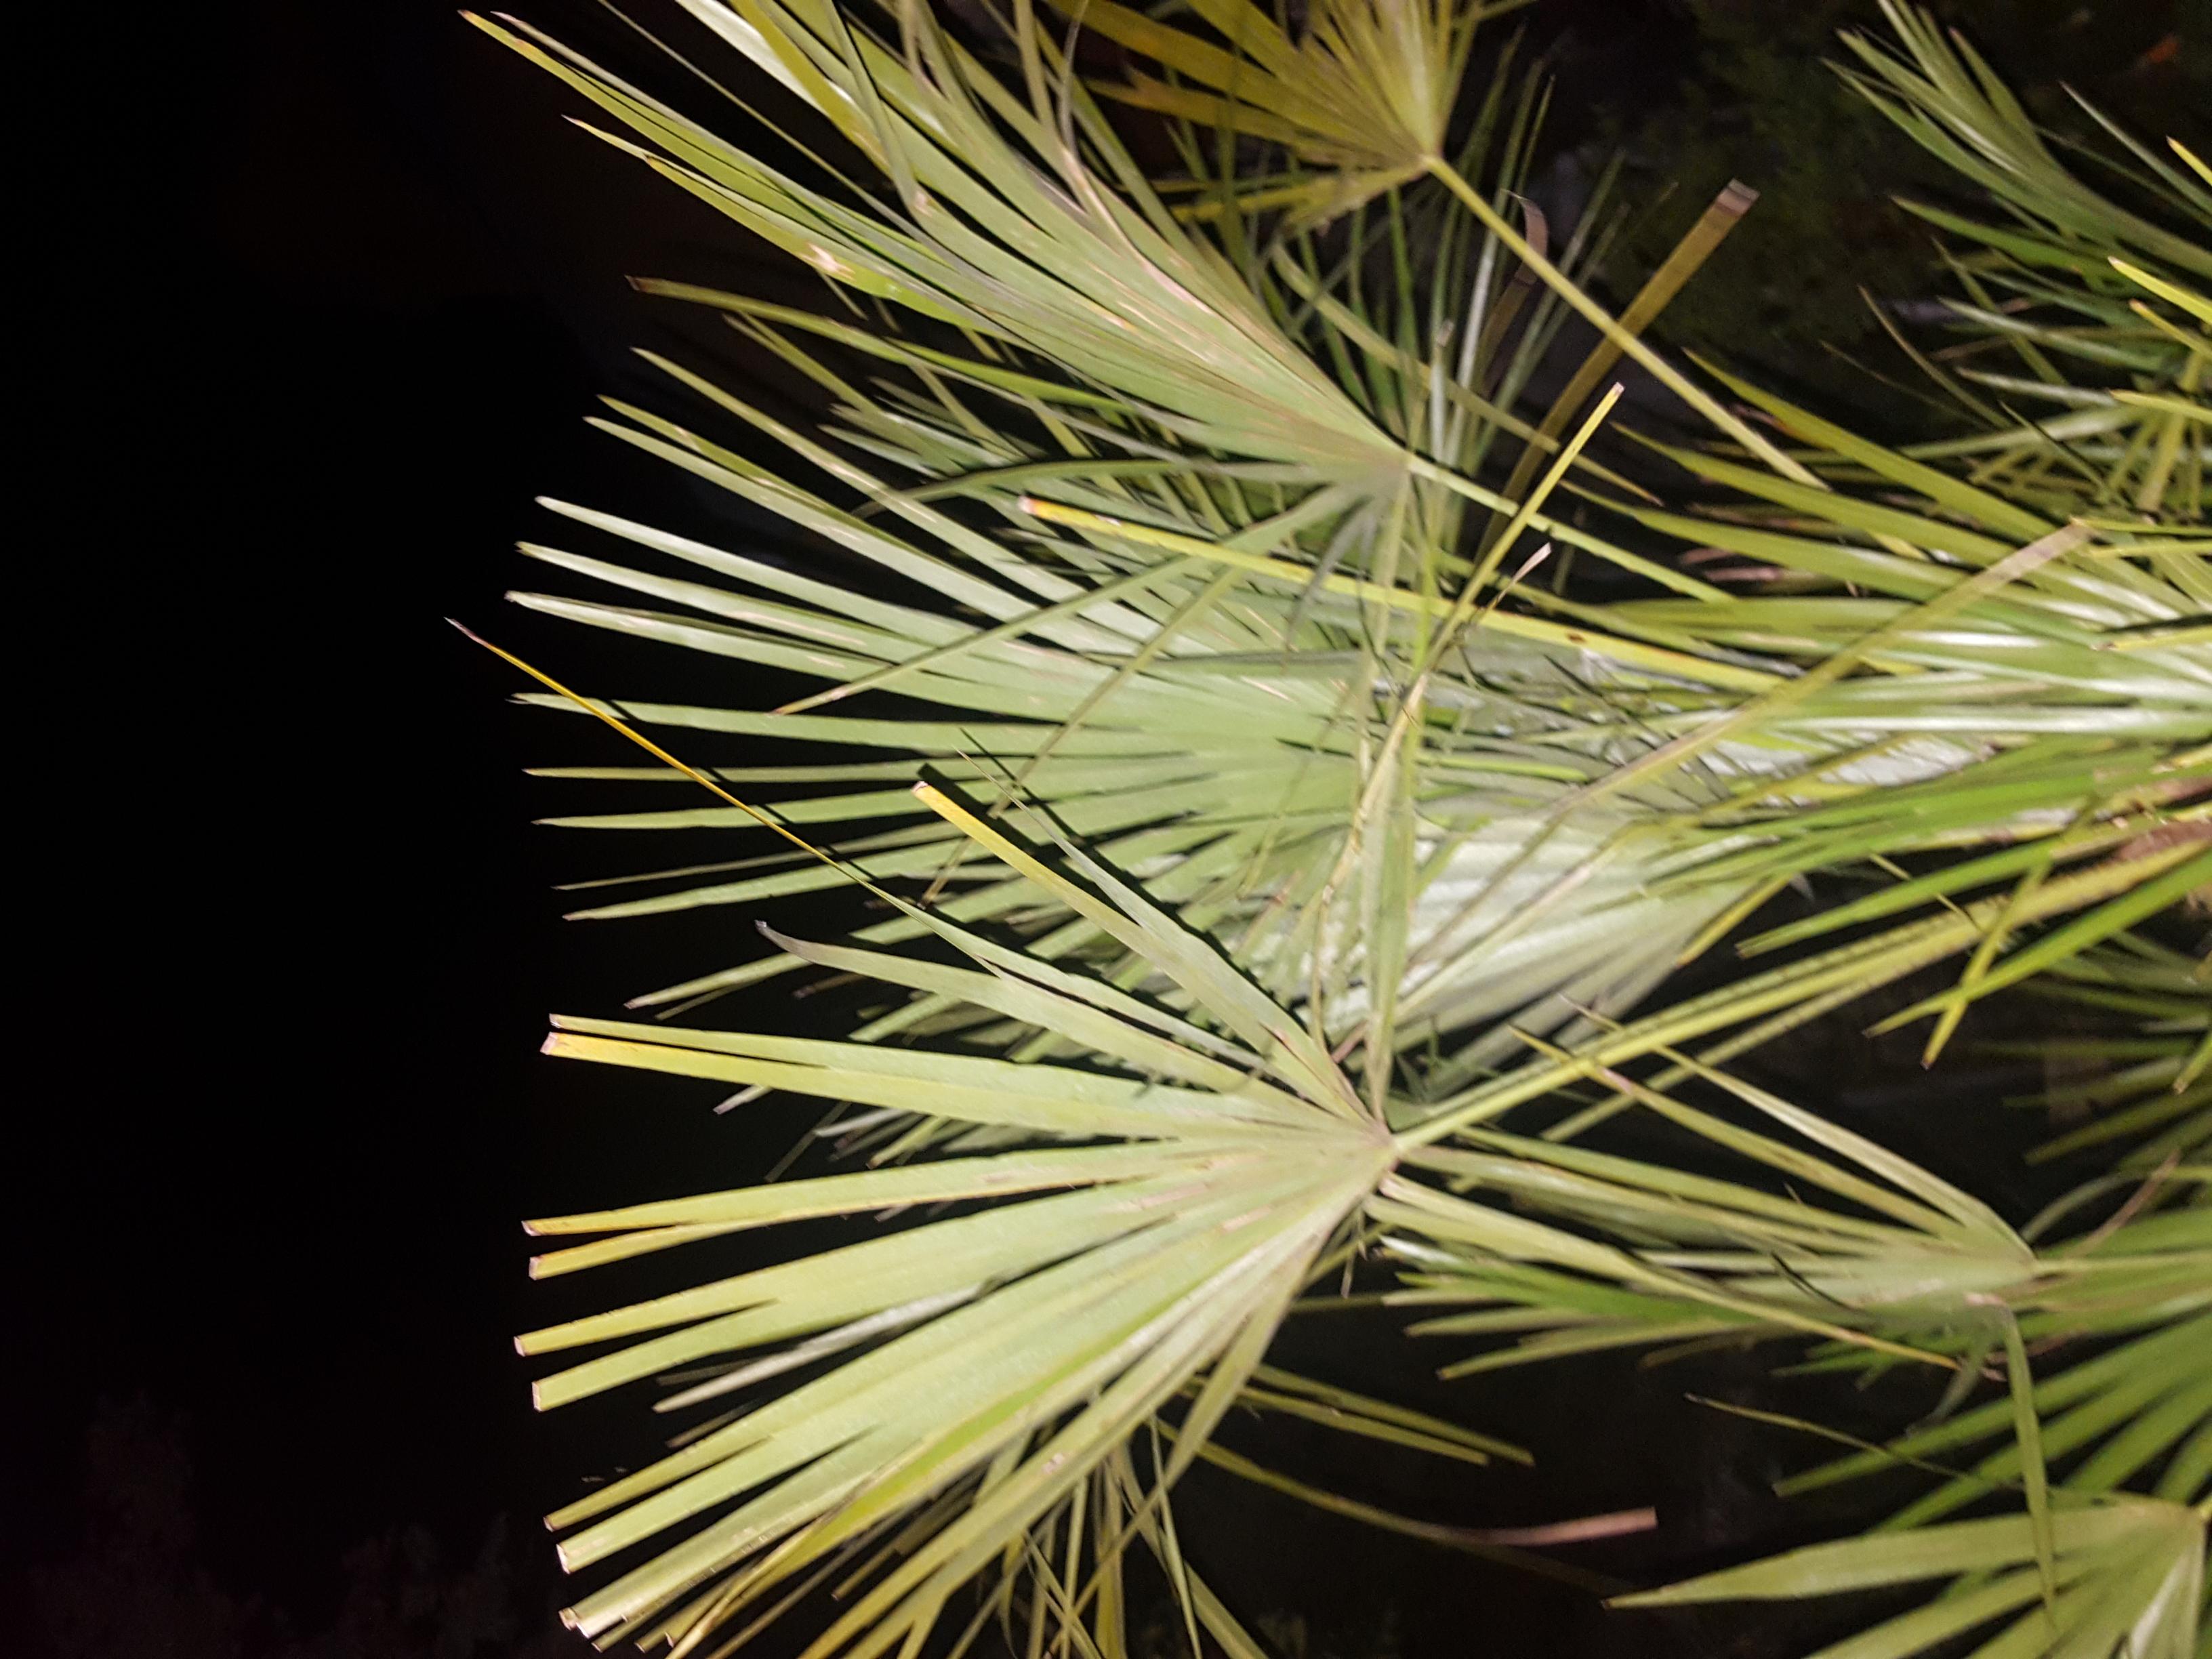 Palmtree at night